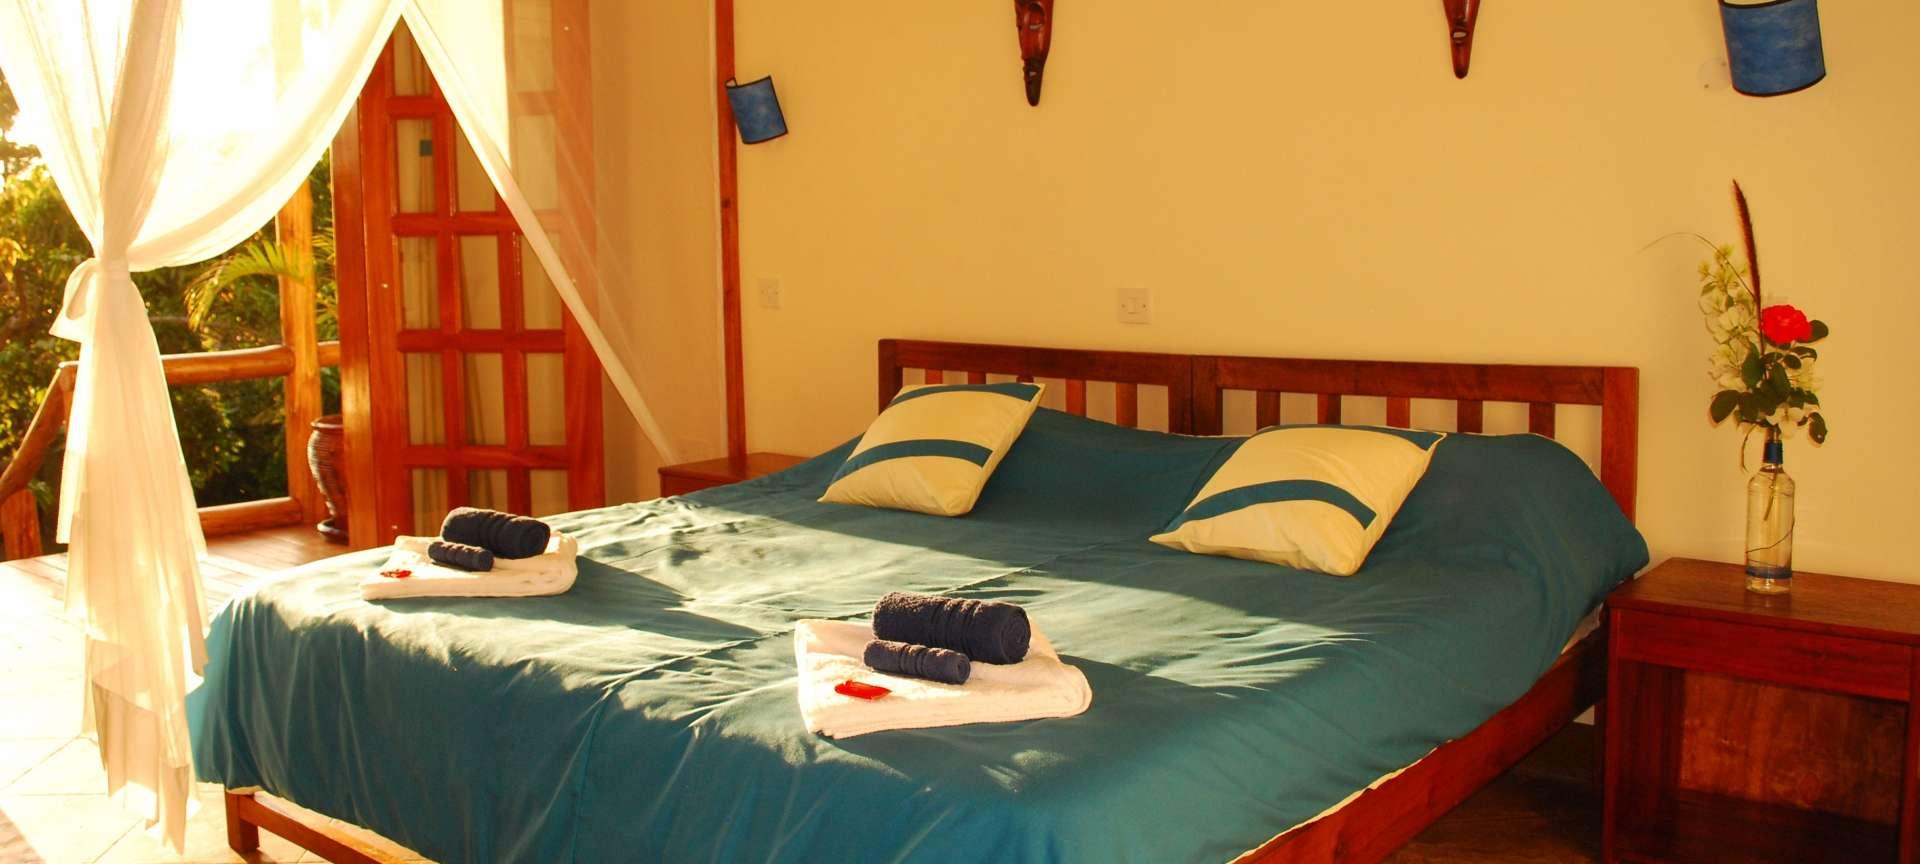 Karibu Guesthouse Entebbe Discover Africa Safaris